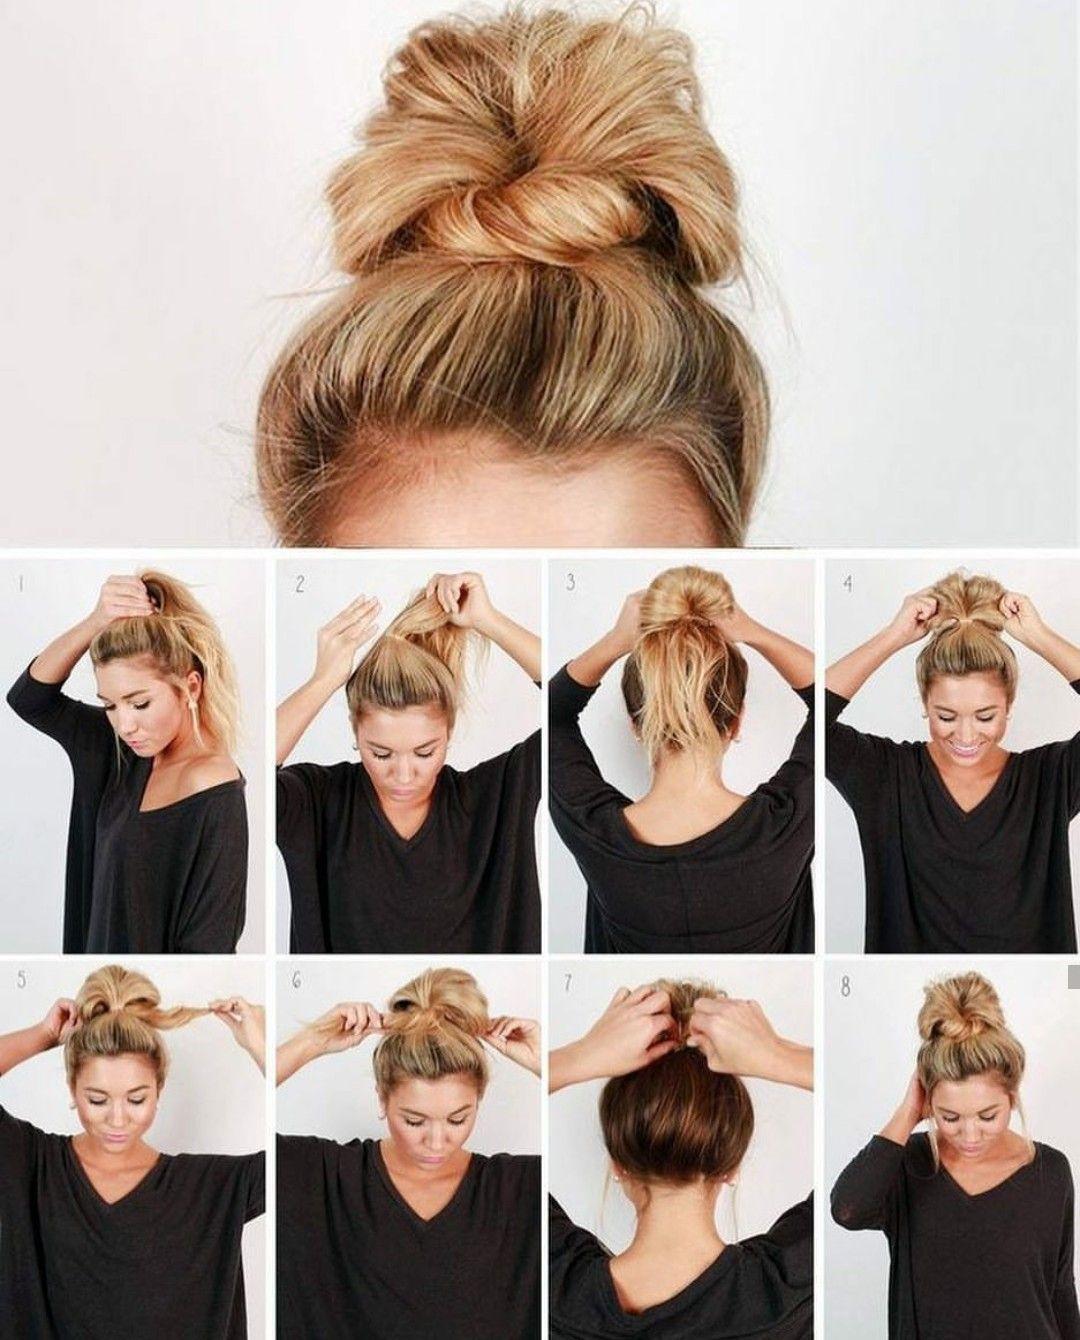 Pin By Varsha Sharma On Hair Pinterest Frisuren